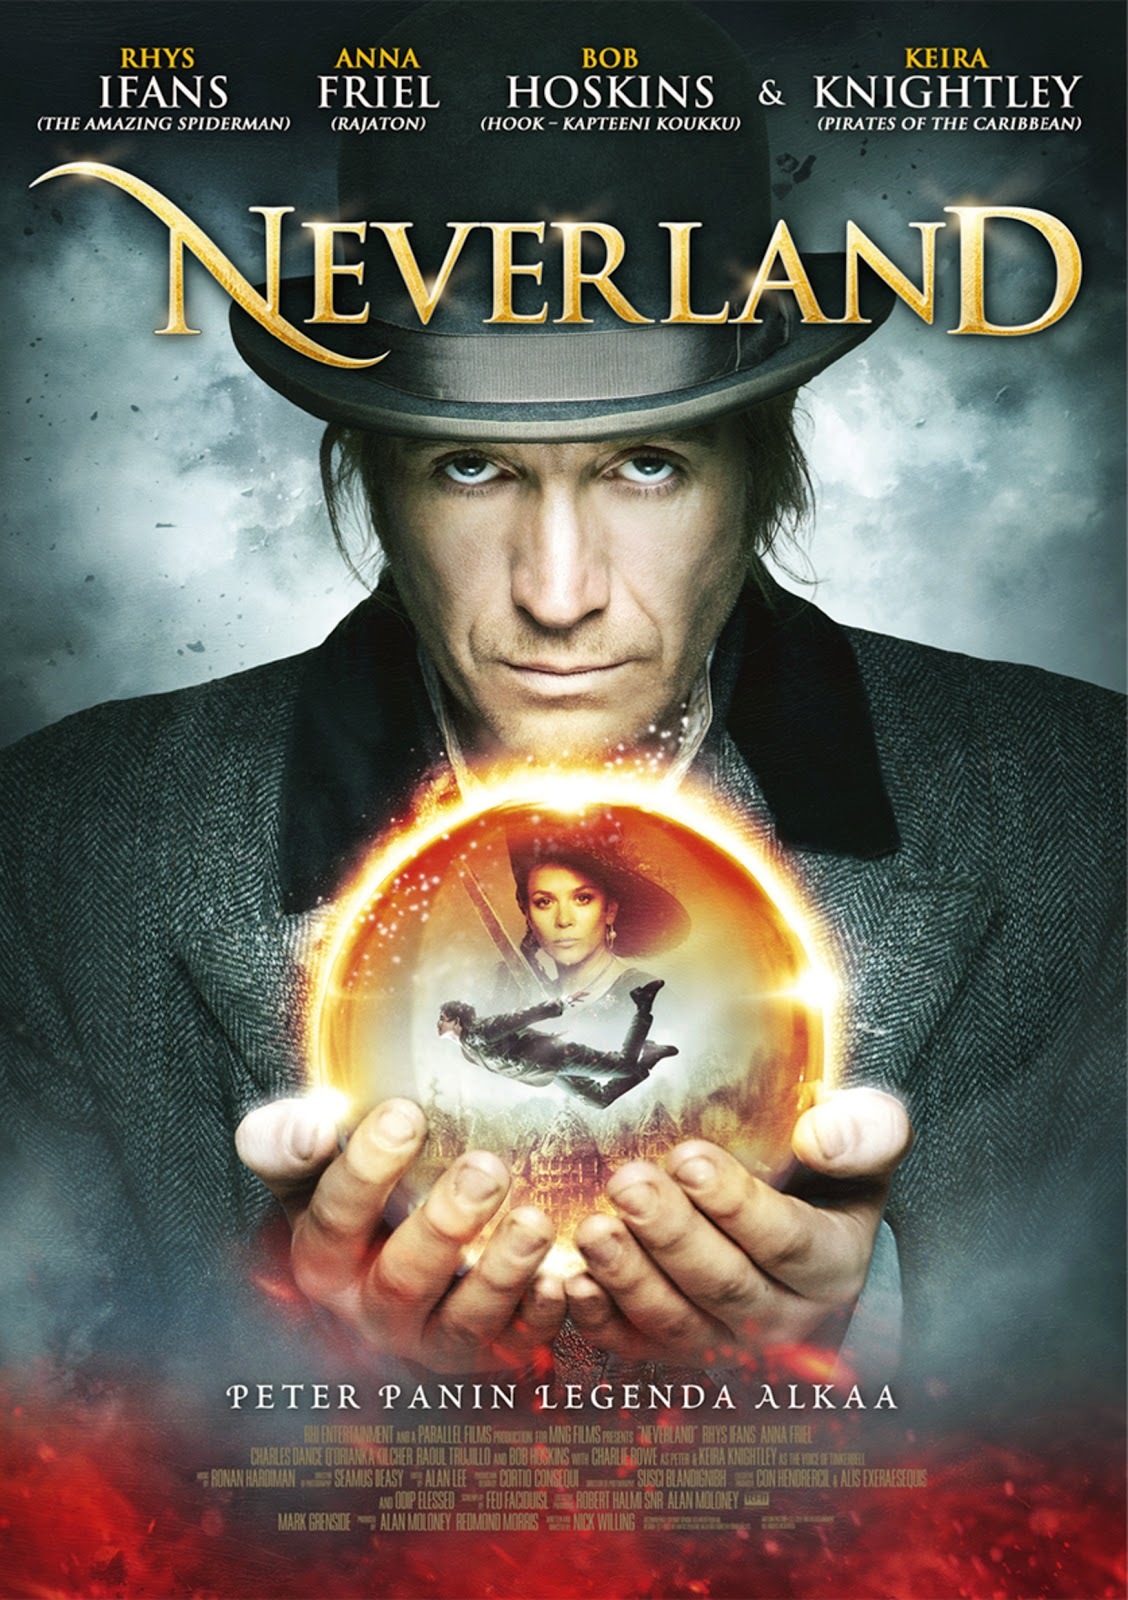 Neverland แดนมหัศจรรย์ กำเนิดปีเตอร์แพน [HD][พากย์ไทย]